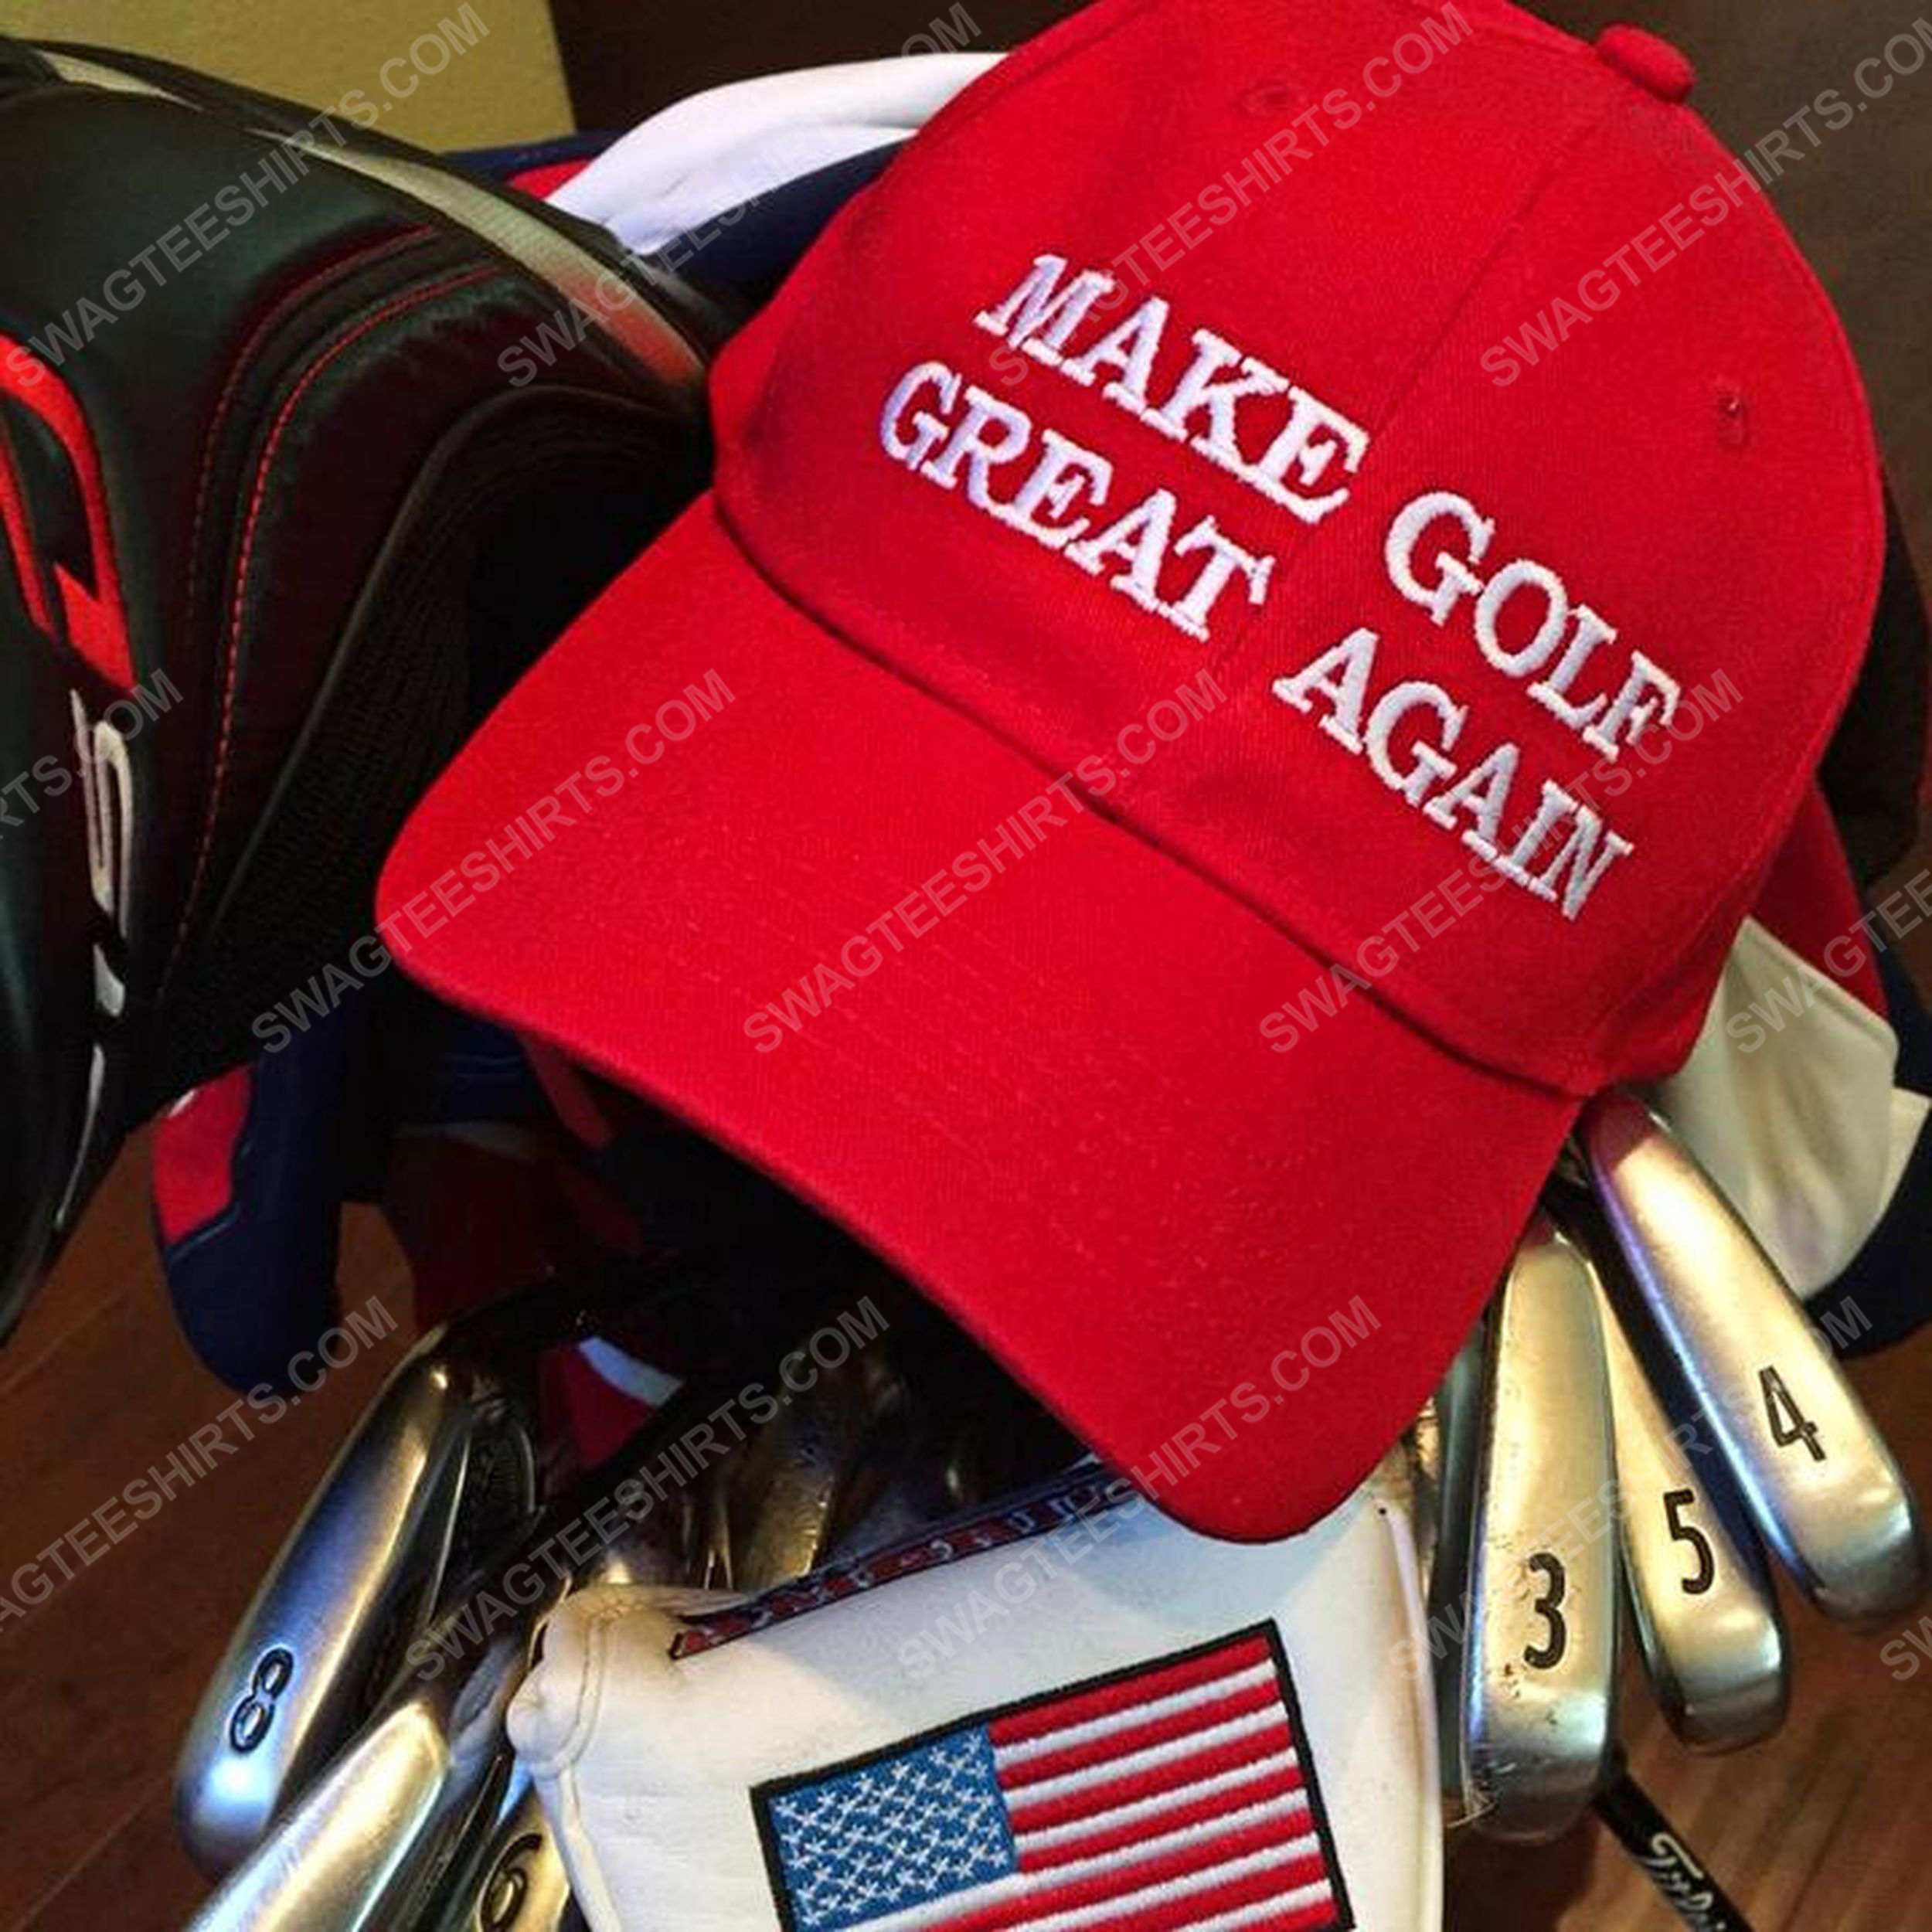 Make golf great again full print classic hat 1 - Copy (3)